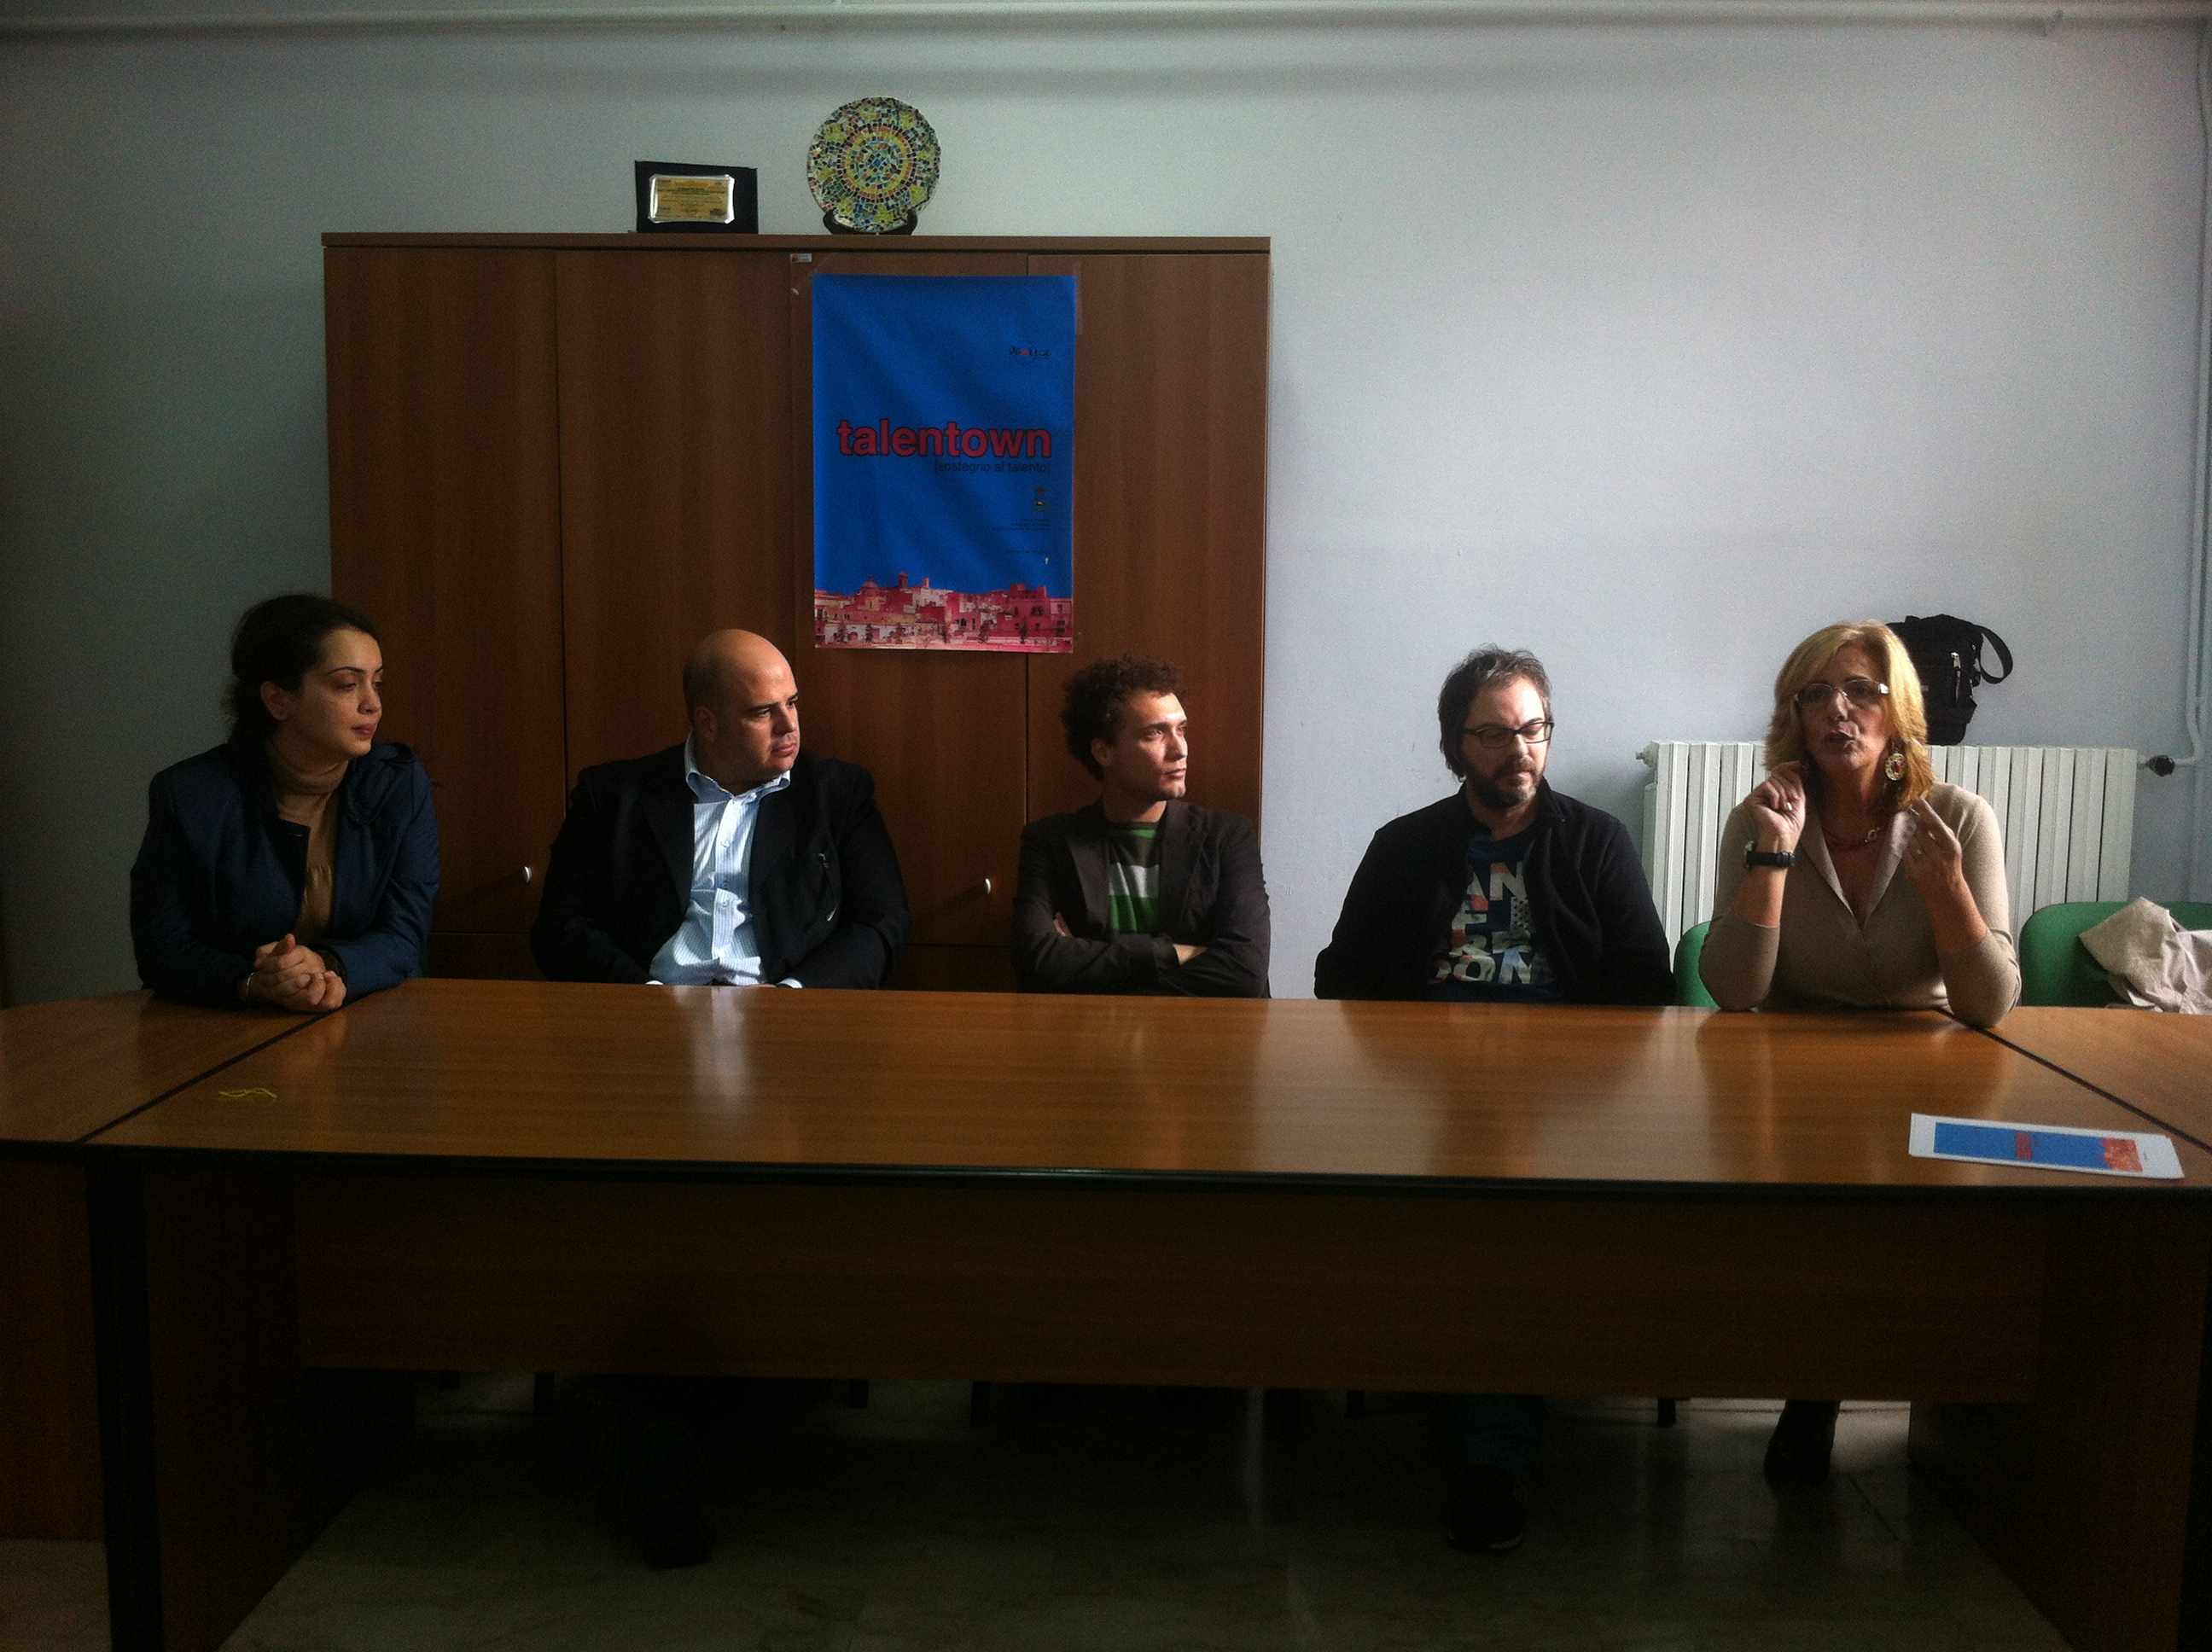 foto-conferenza